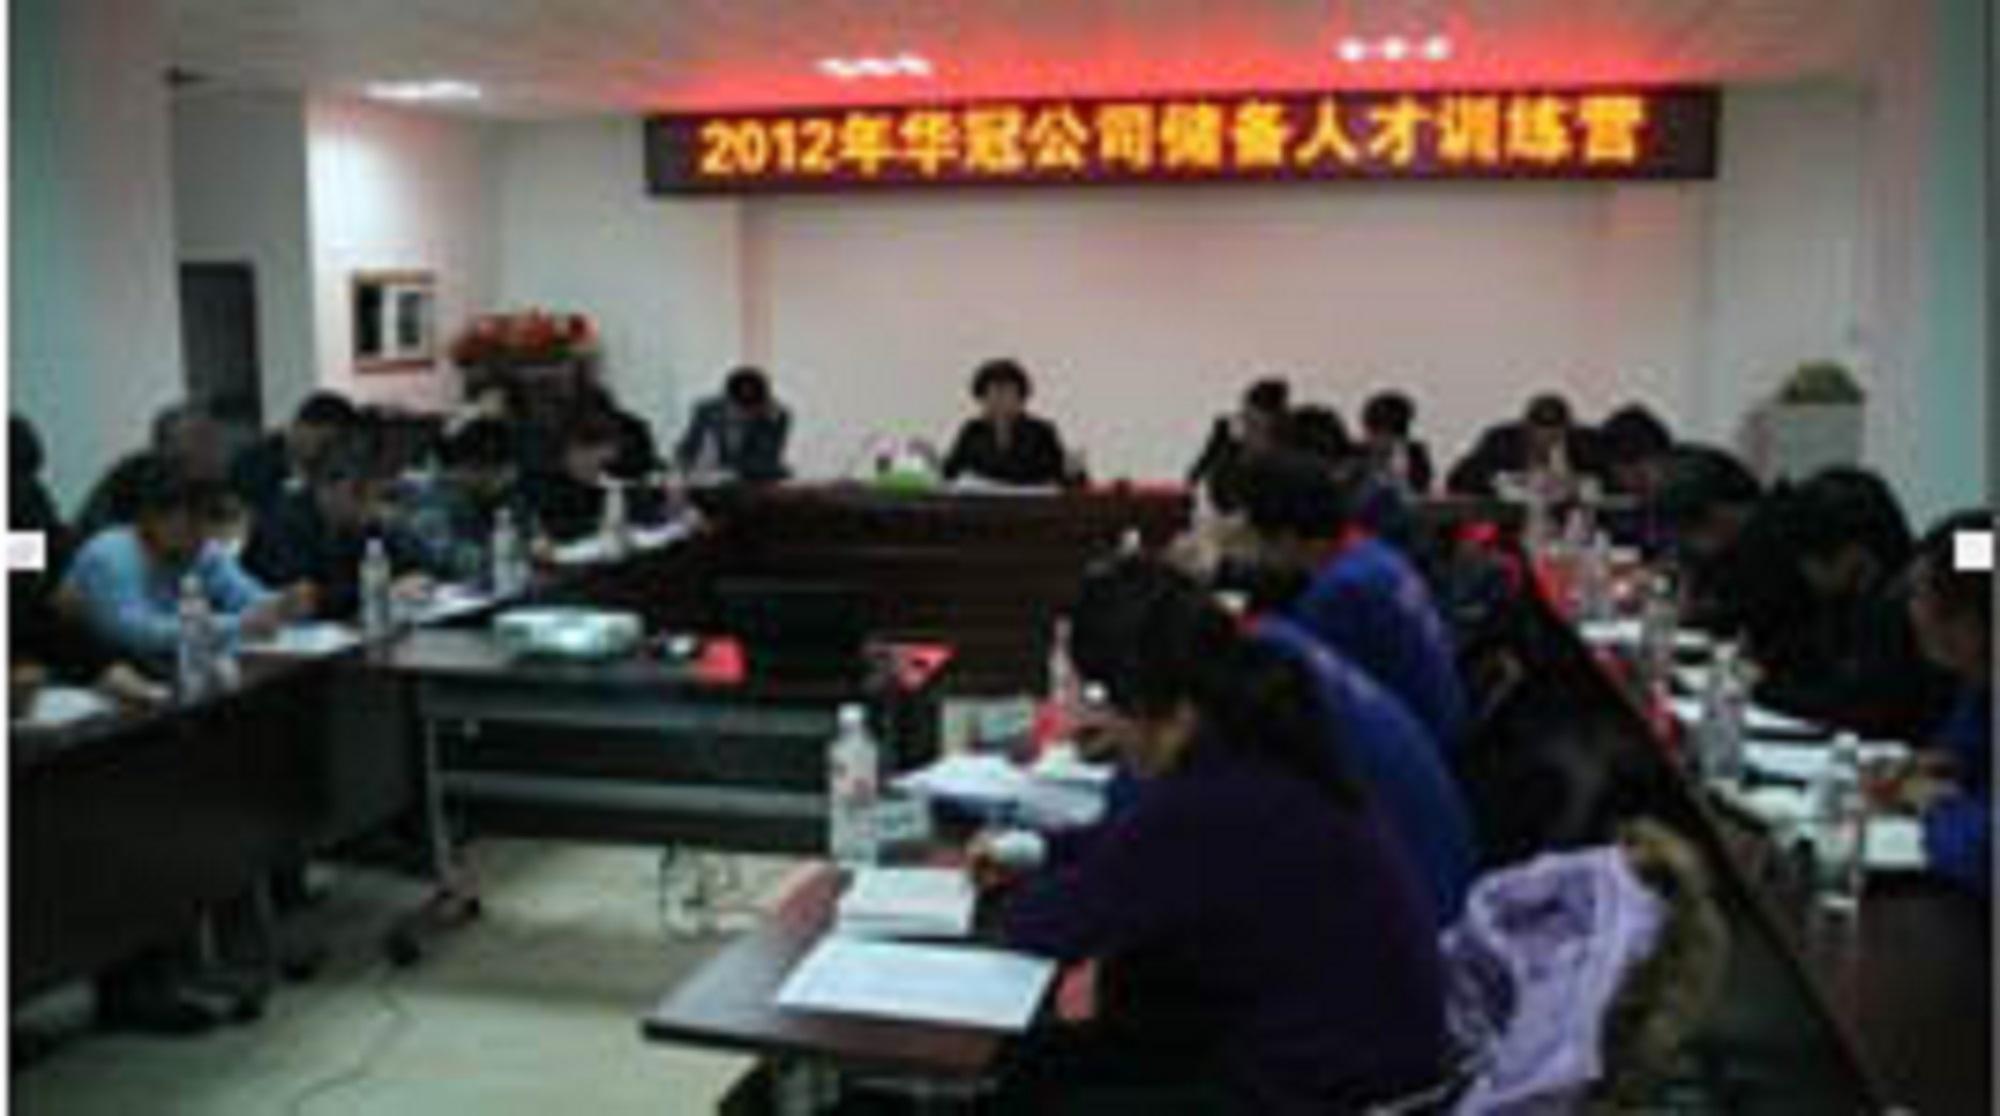 huaguan future leader training programme